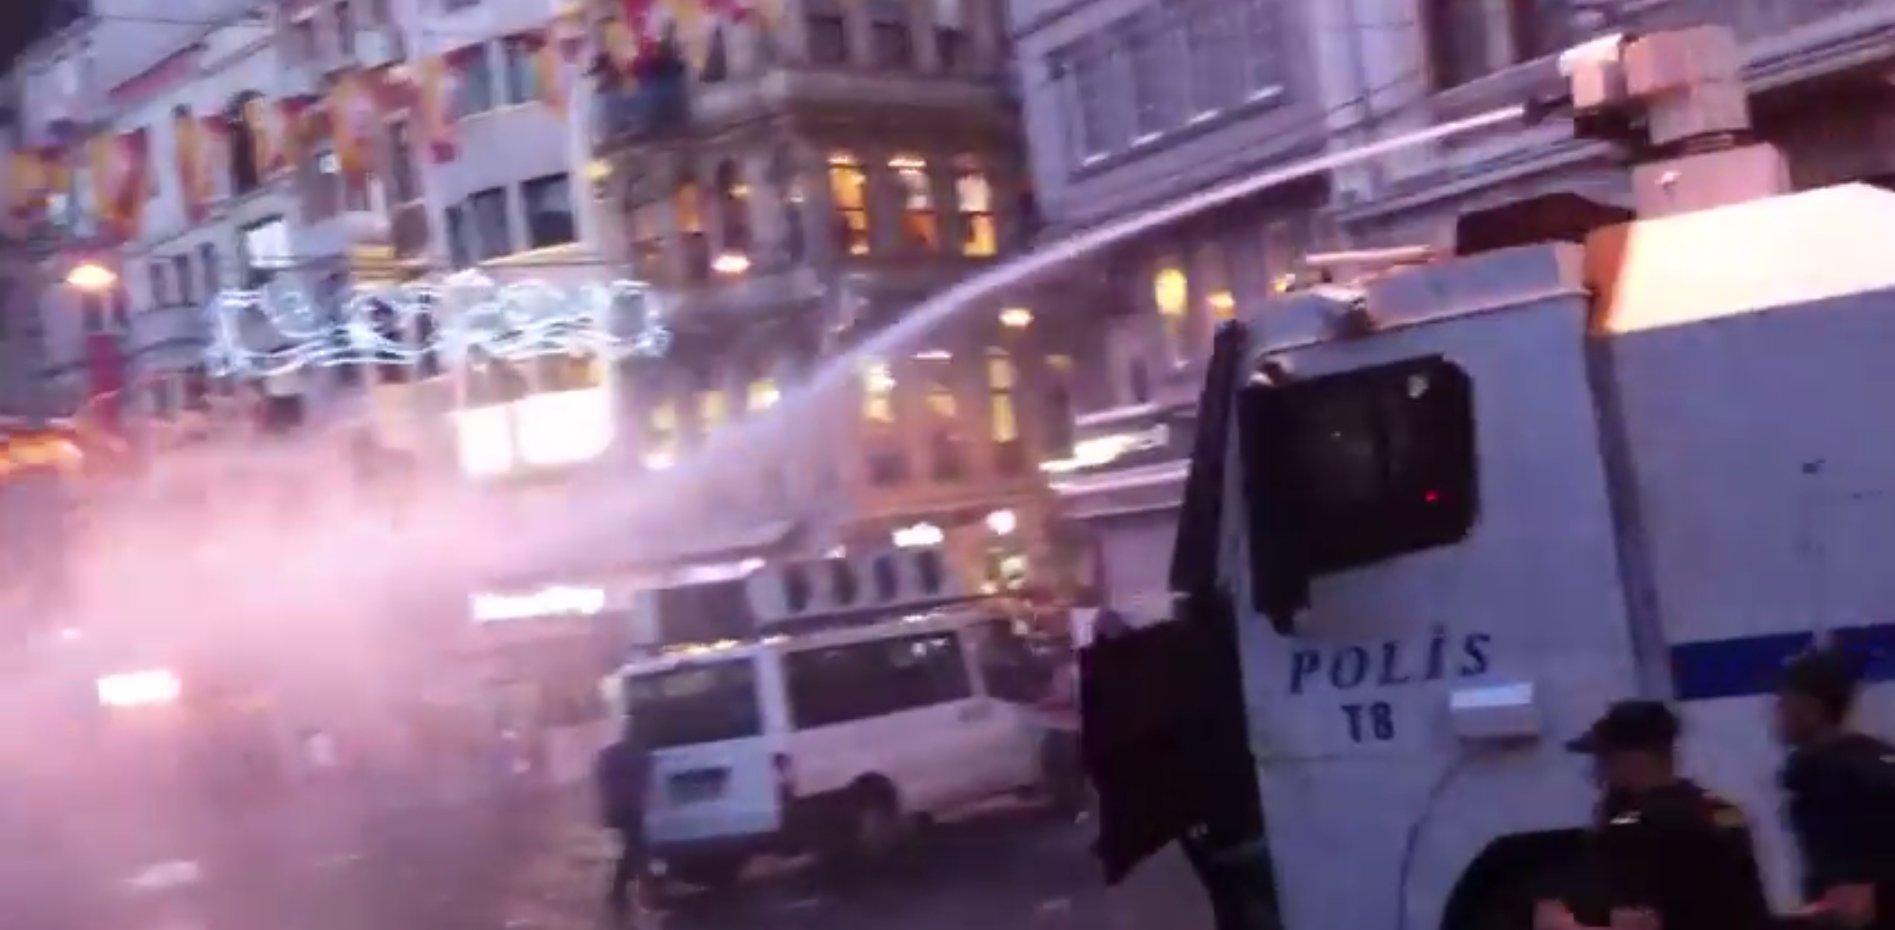 Screenshot_dbate.de_FLASH_Istanbul_Proteste_Selbstmordattentat_2015